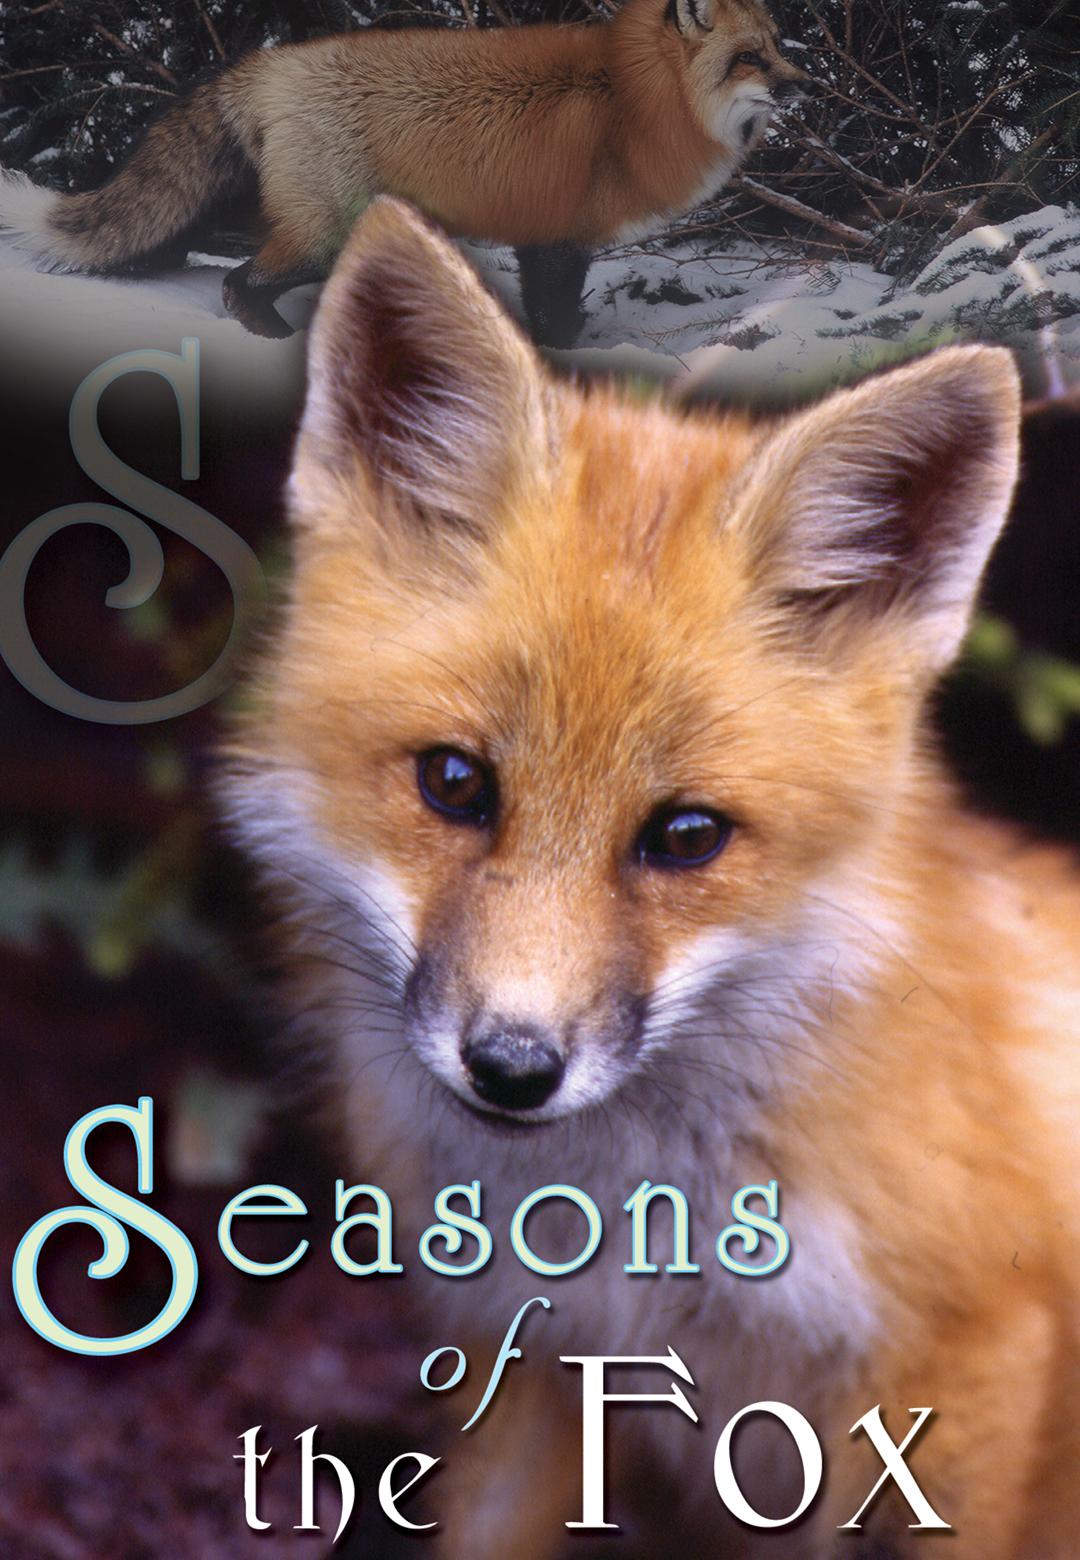 Seasons of the Fox